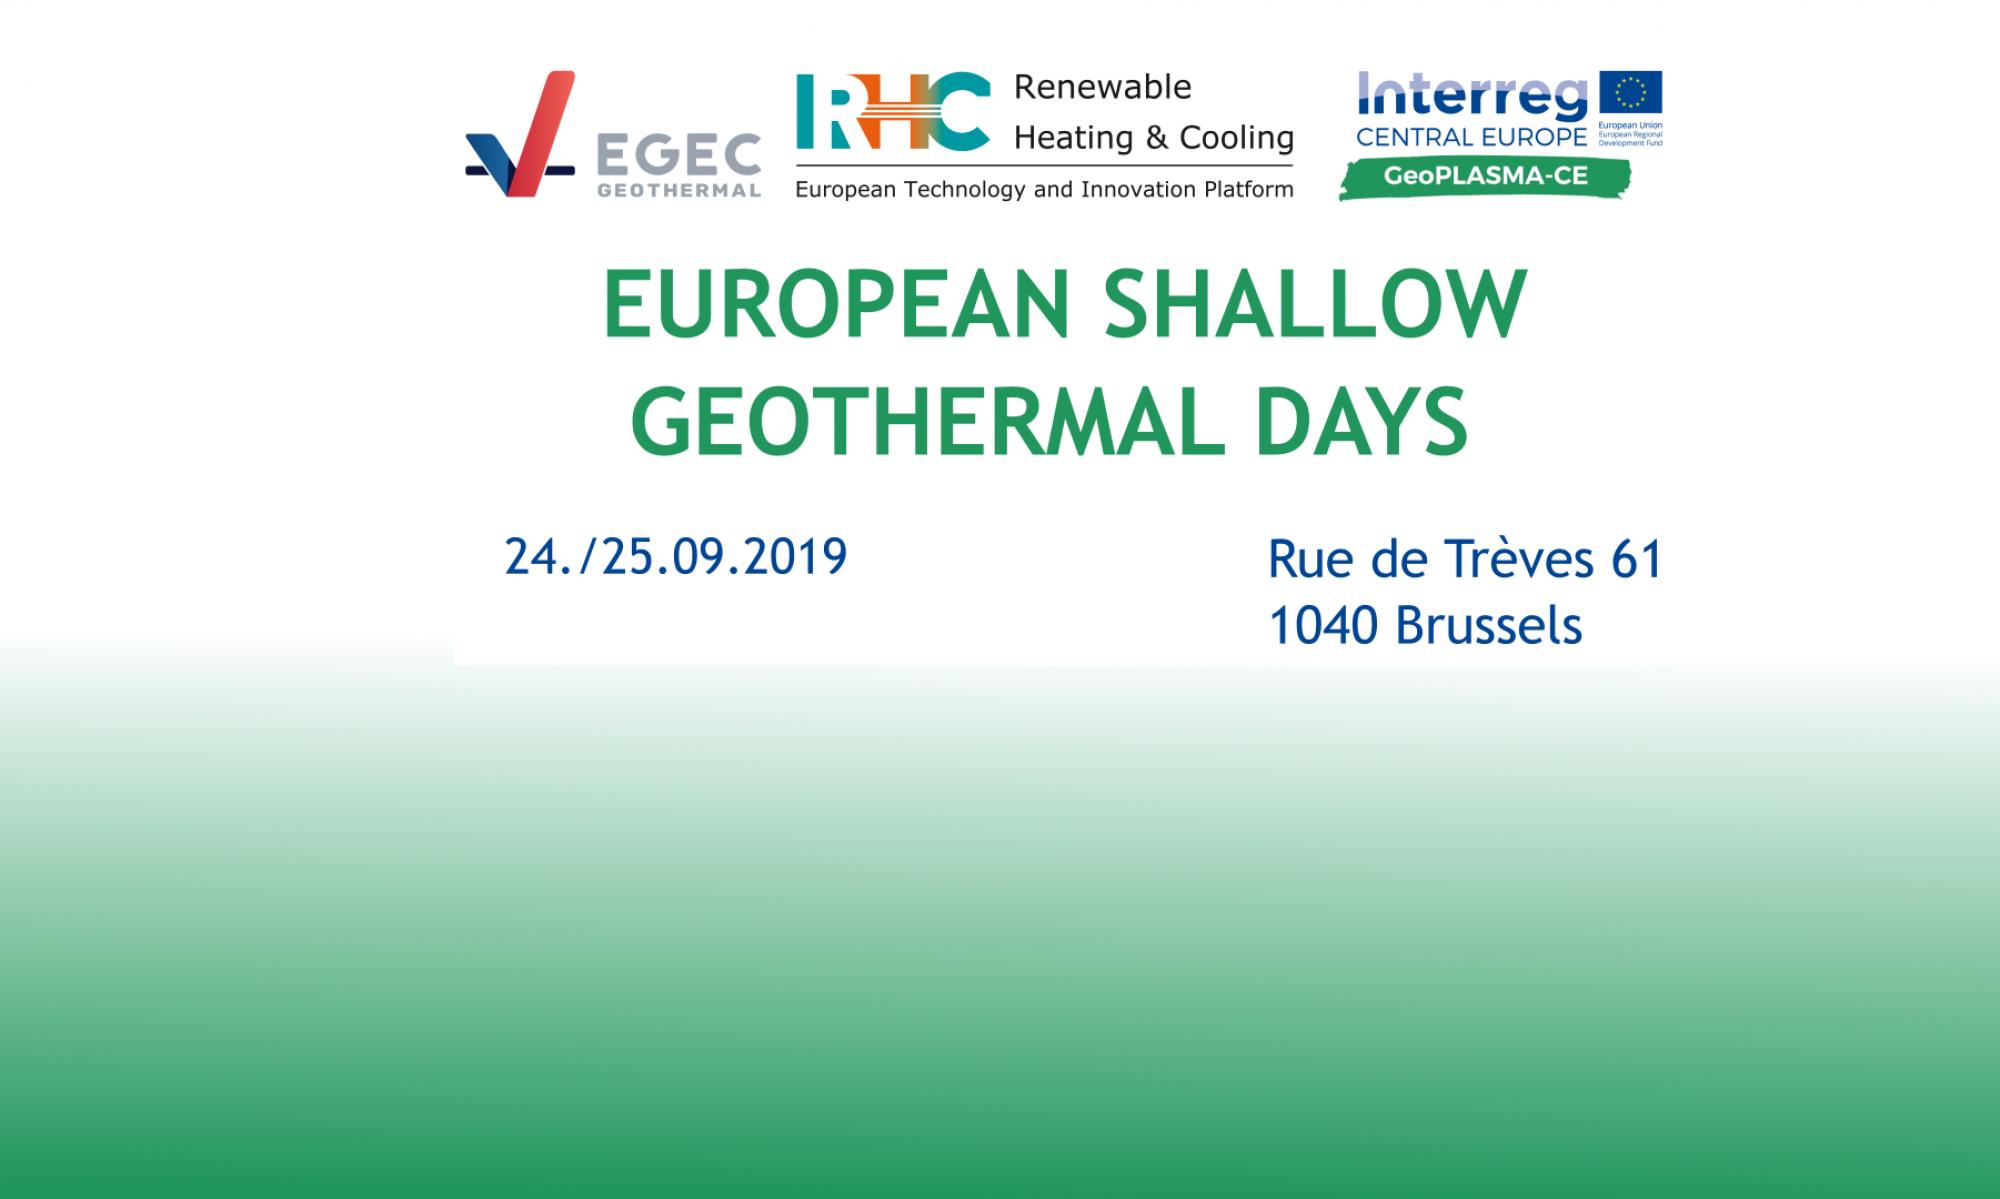 Geothermal Days